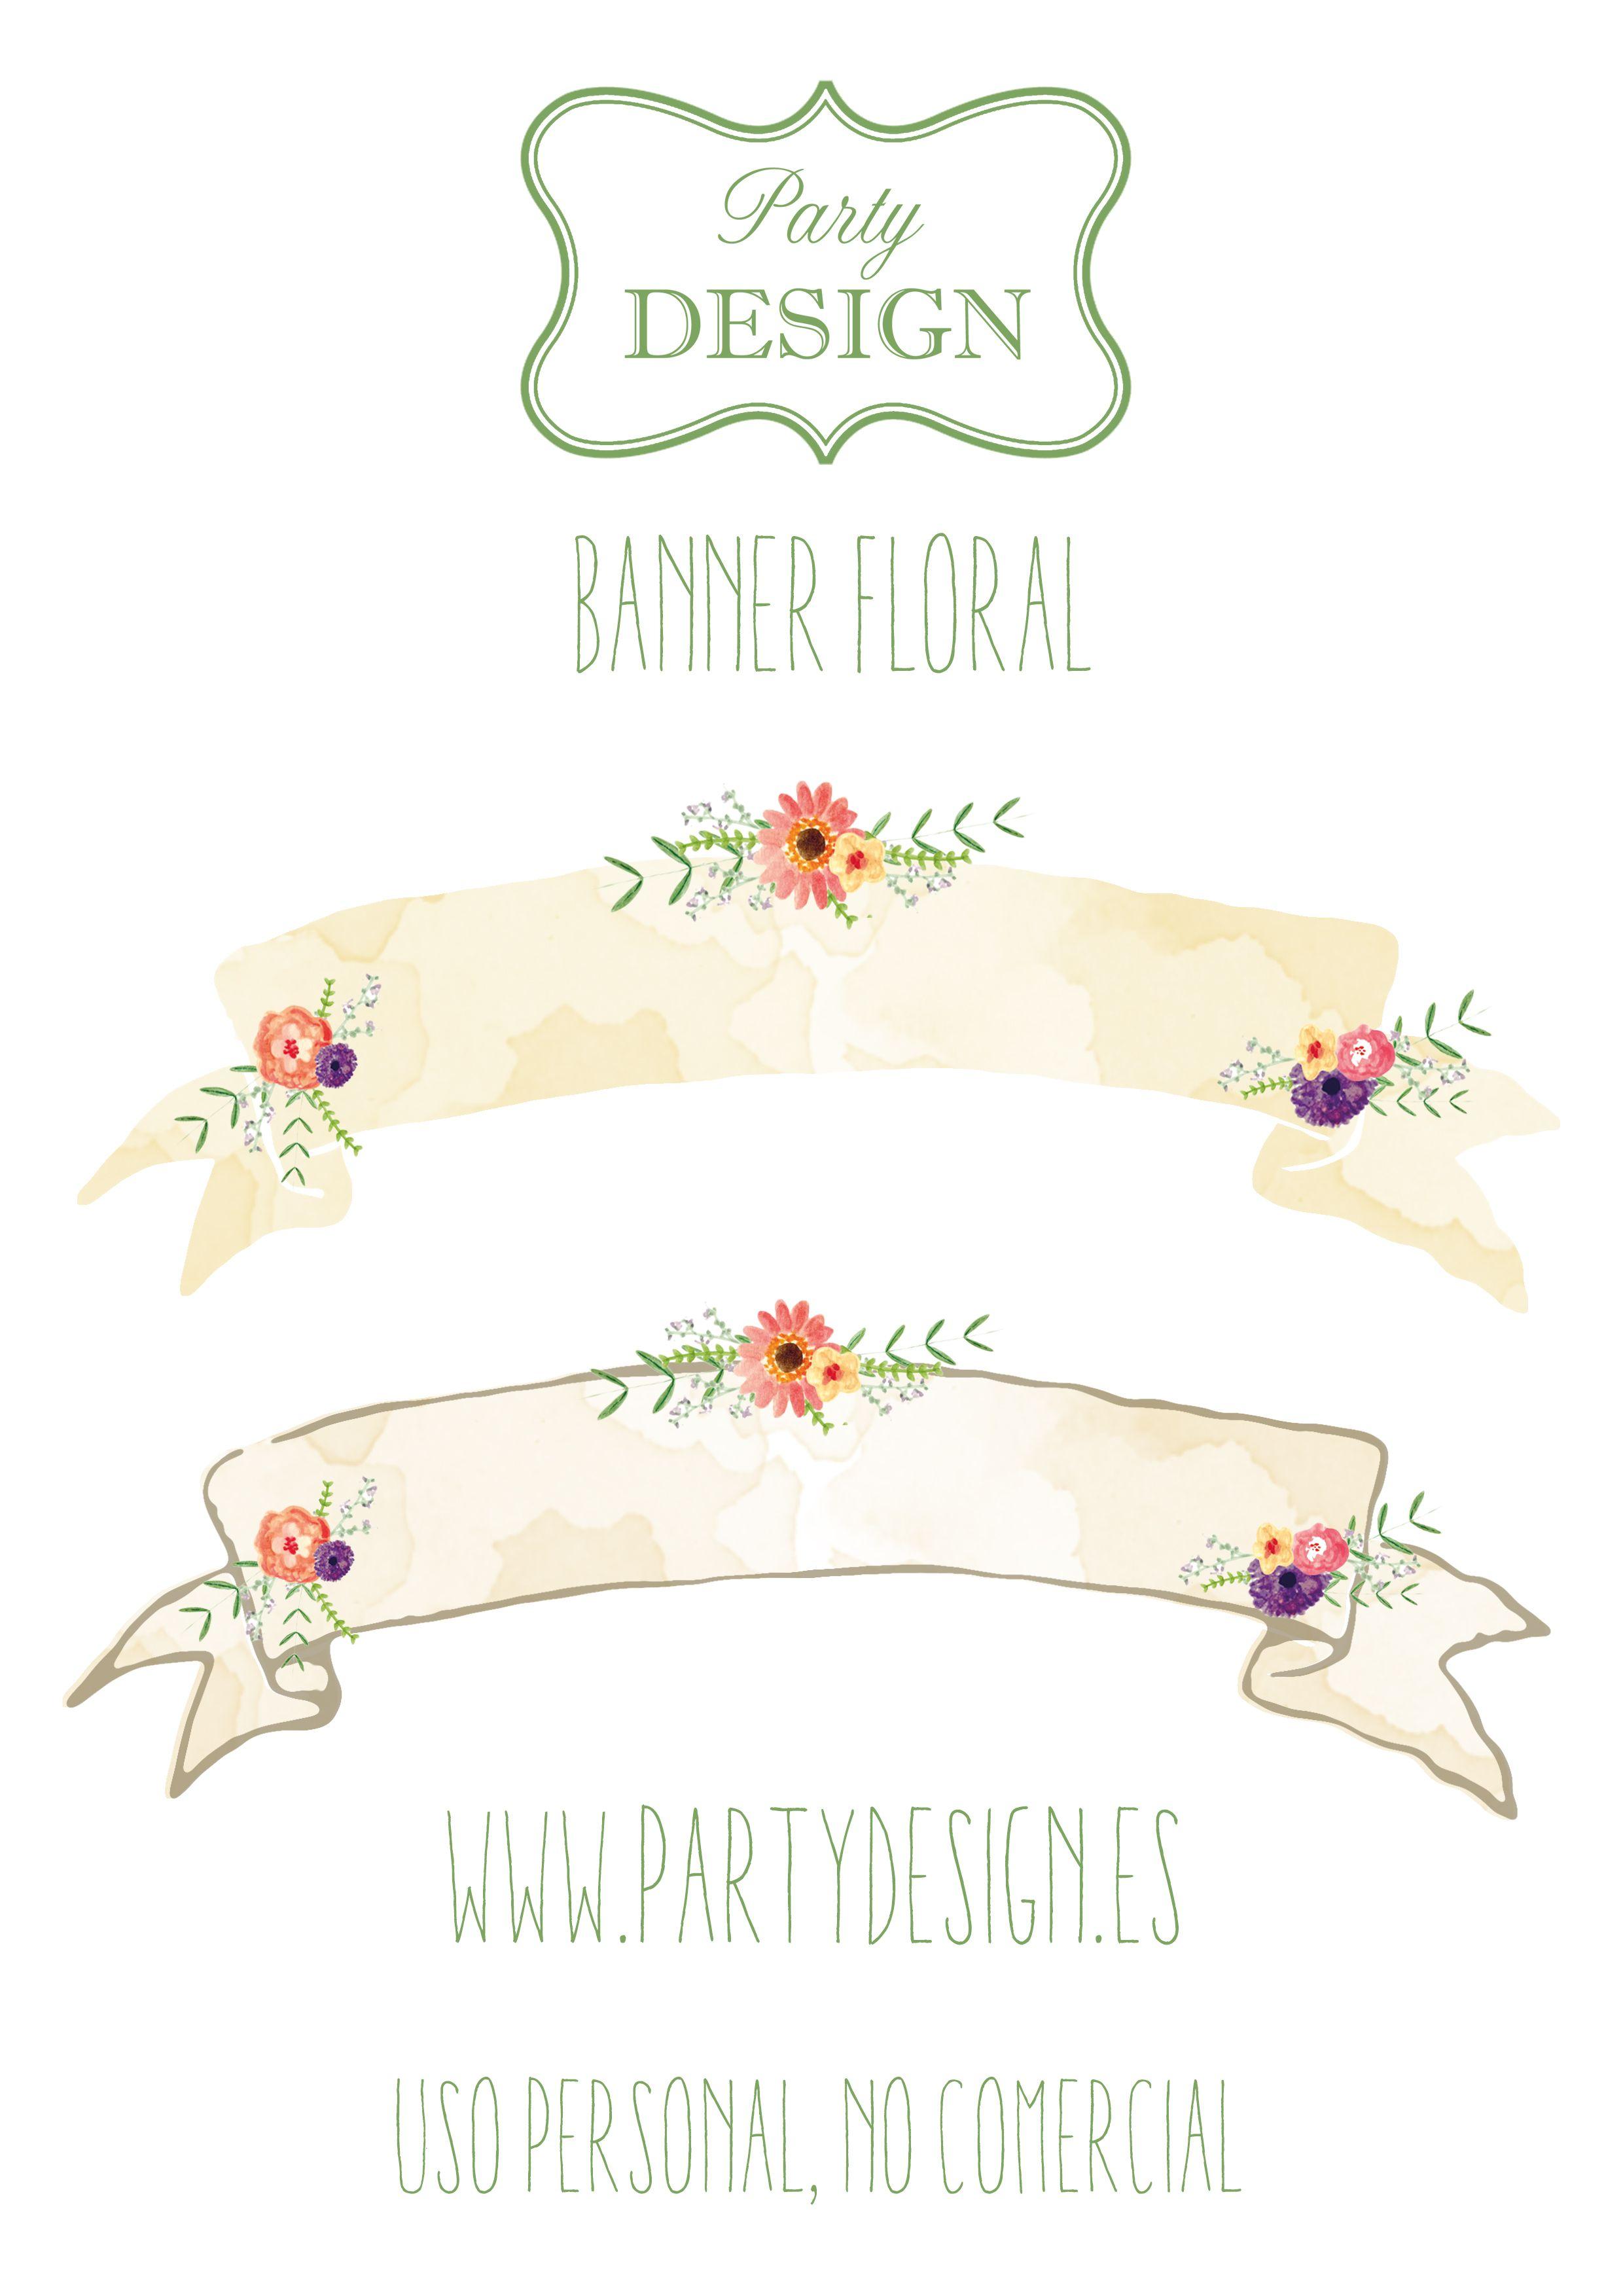 Descarga gratis banner para decorar tartas y pasteles Printable free ...